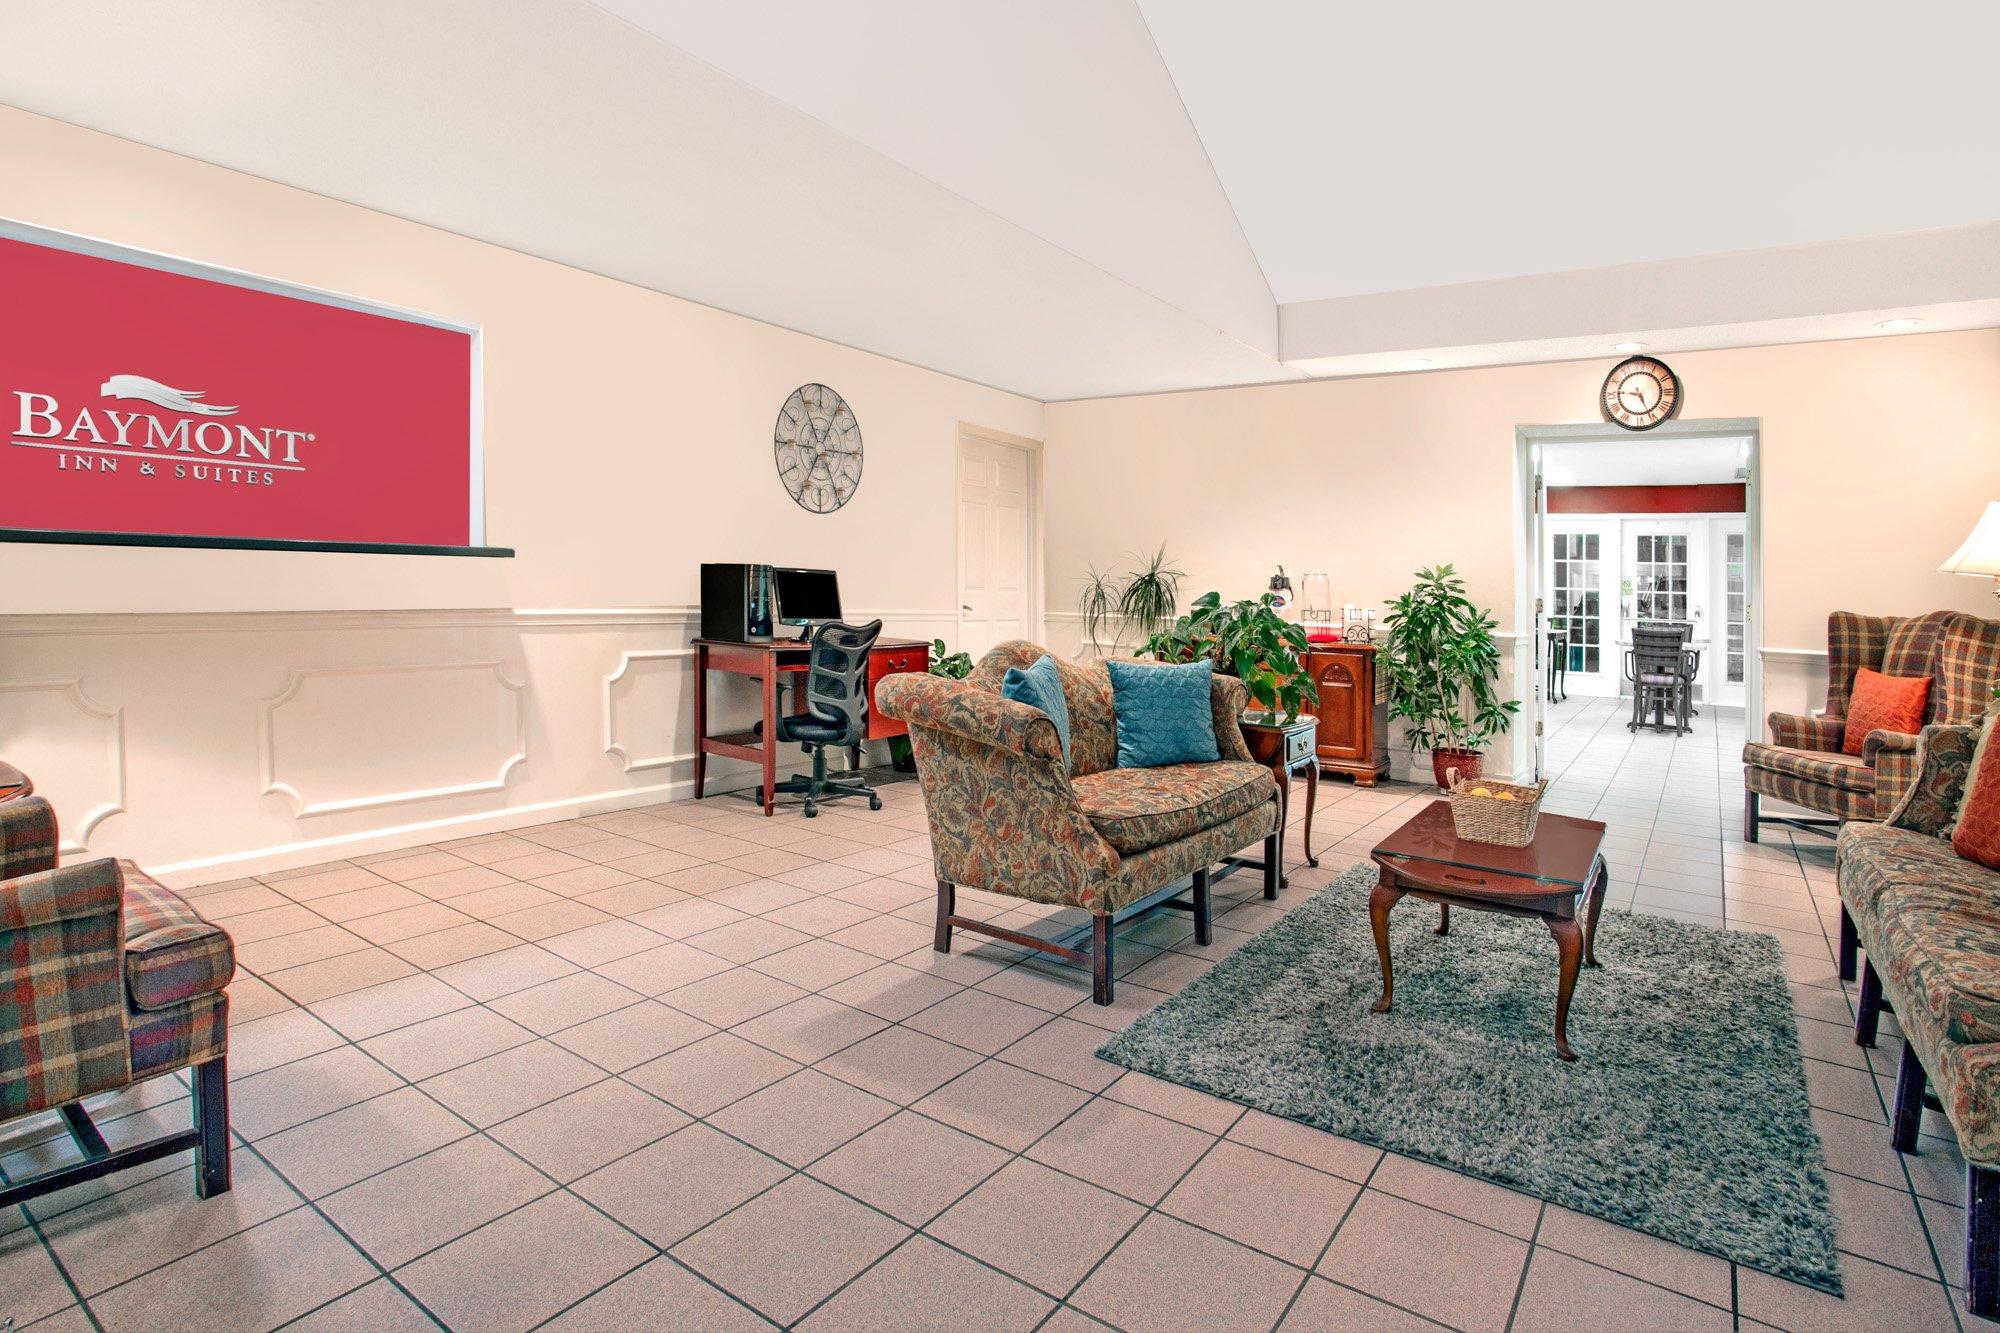 Baymont Inn & Suites Brunswick GA